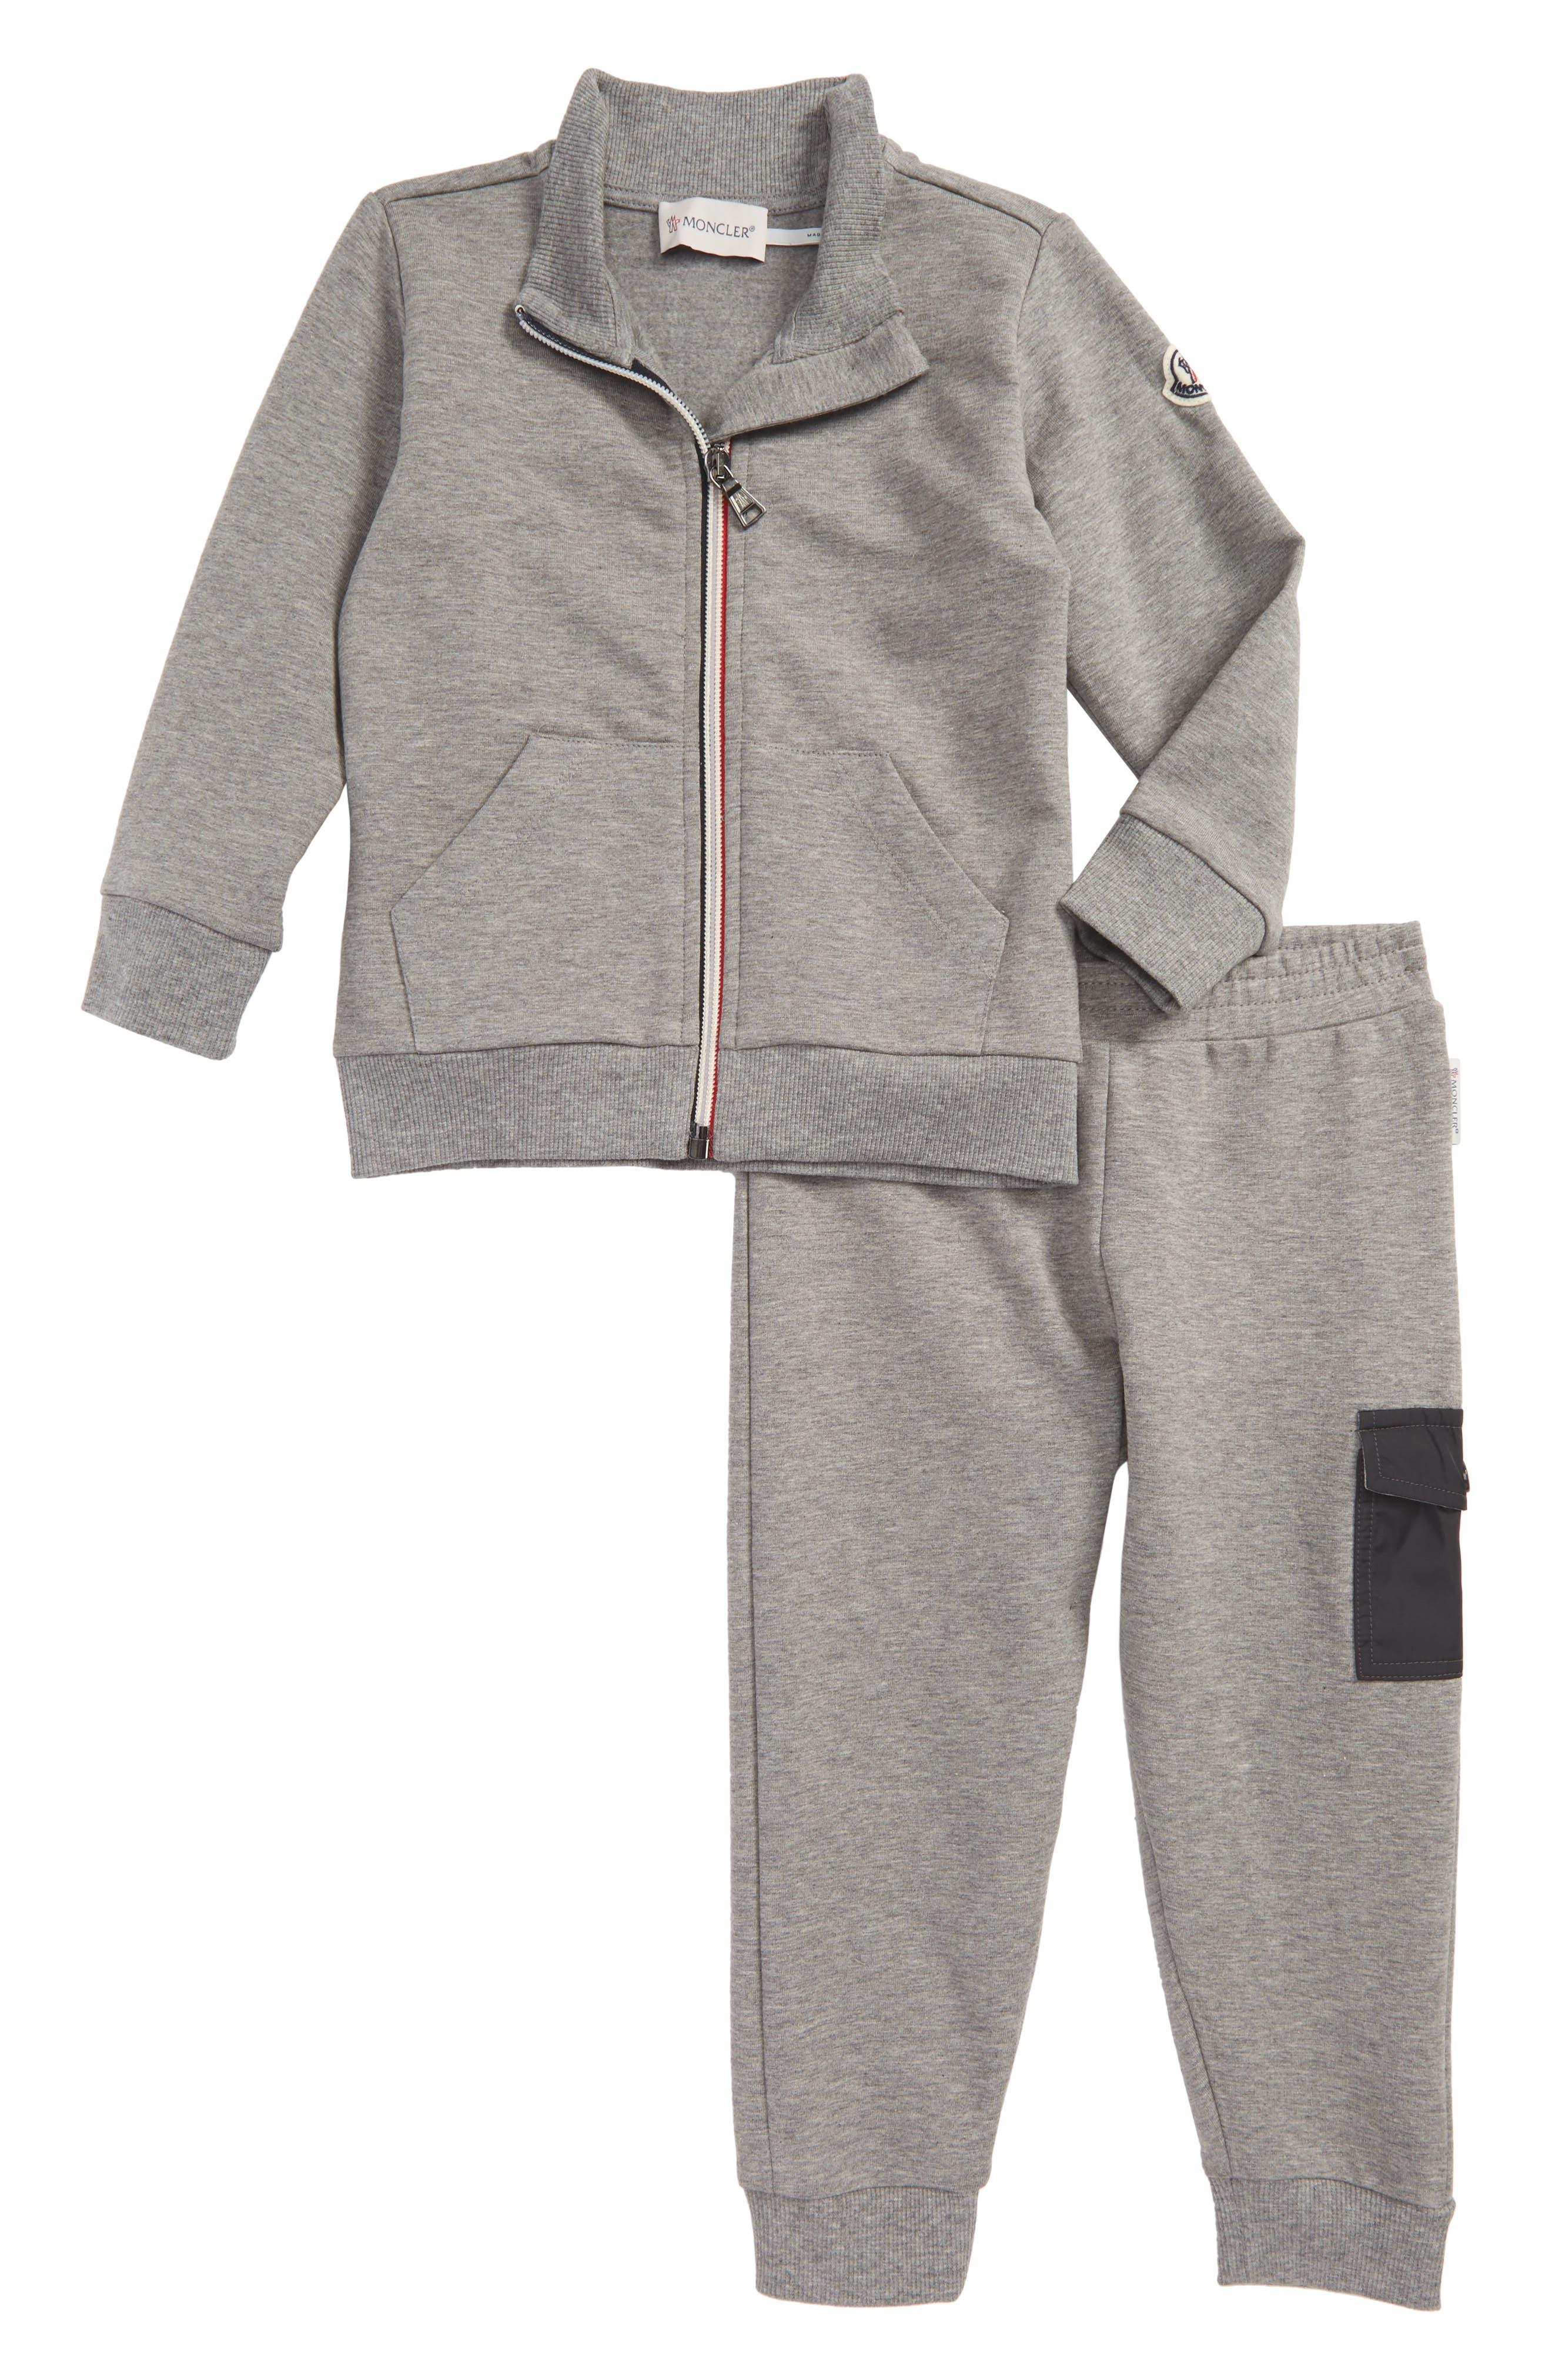 Main Image - Moncler Zip-Up Jacket & Sweatpants Set (Baby Boys & Toddler Boys)